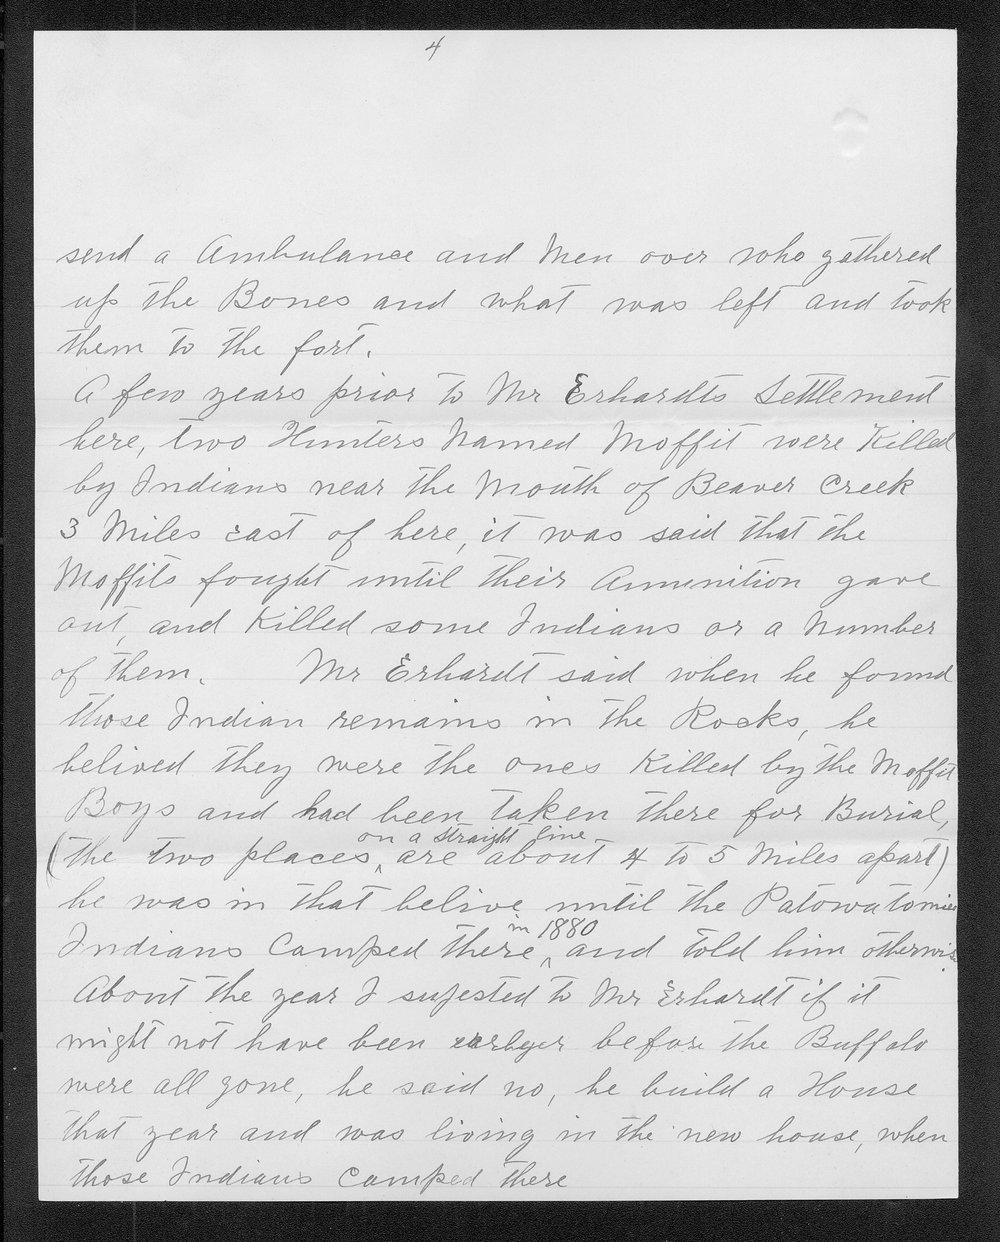 Adolph Roenigk and George W. Martin correspondence - 4